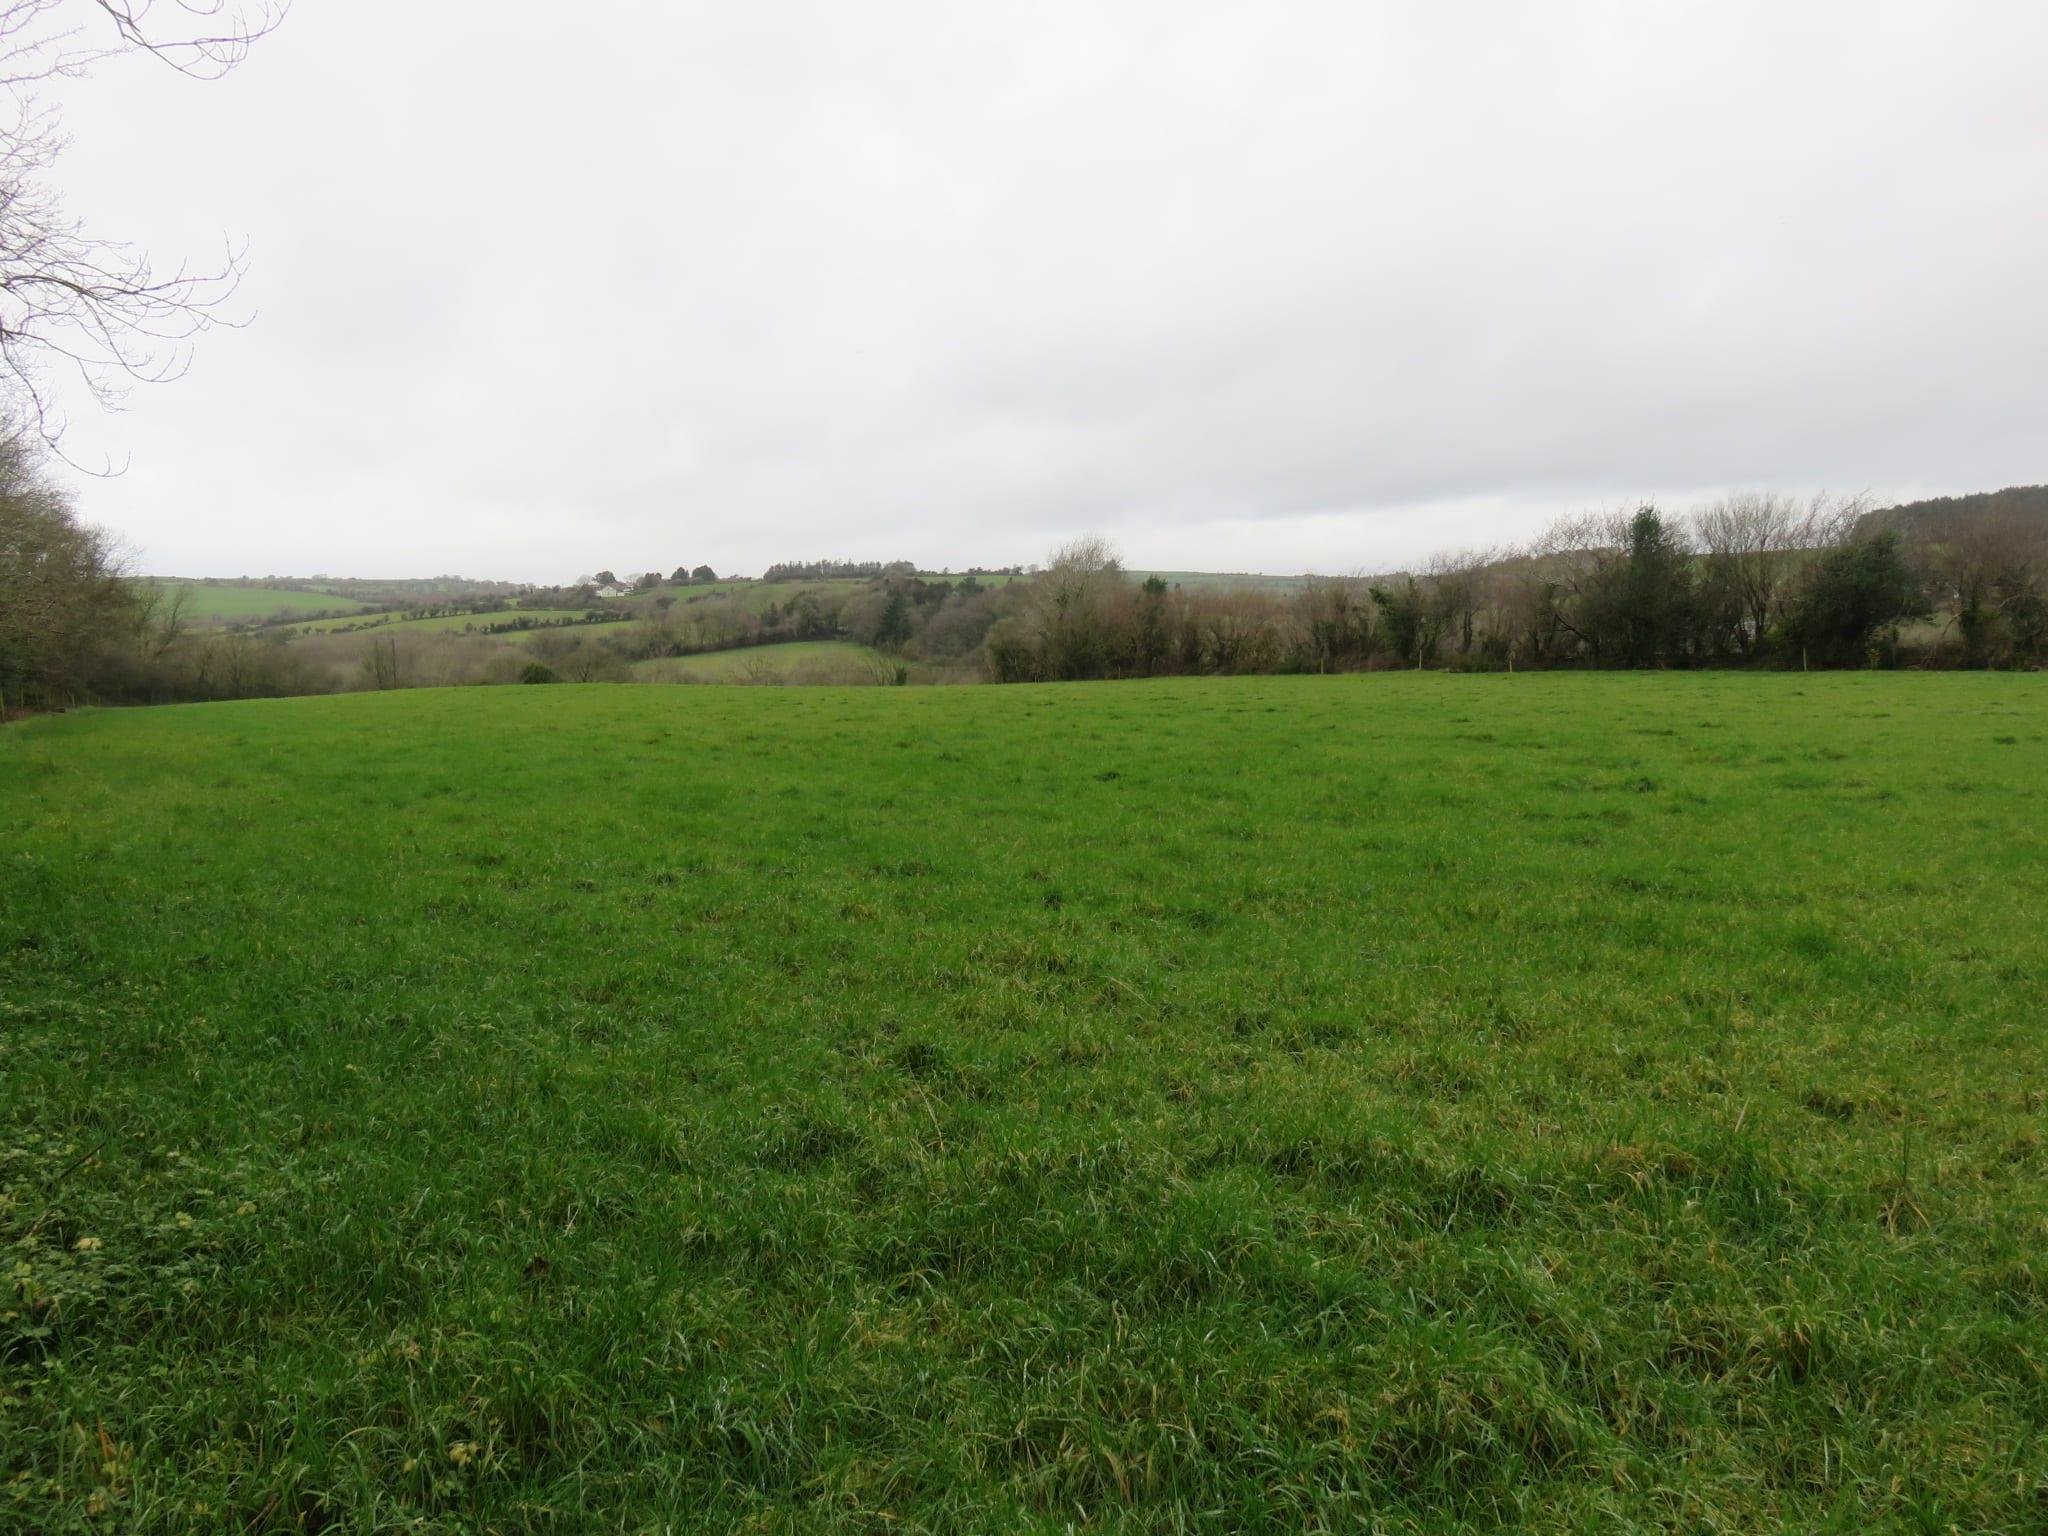 19. Field Photo 2